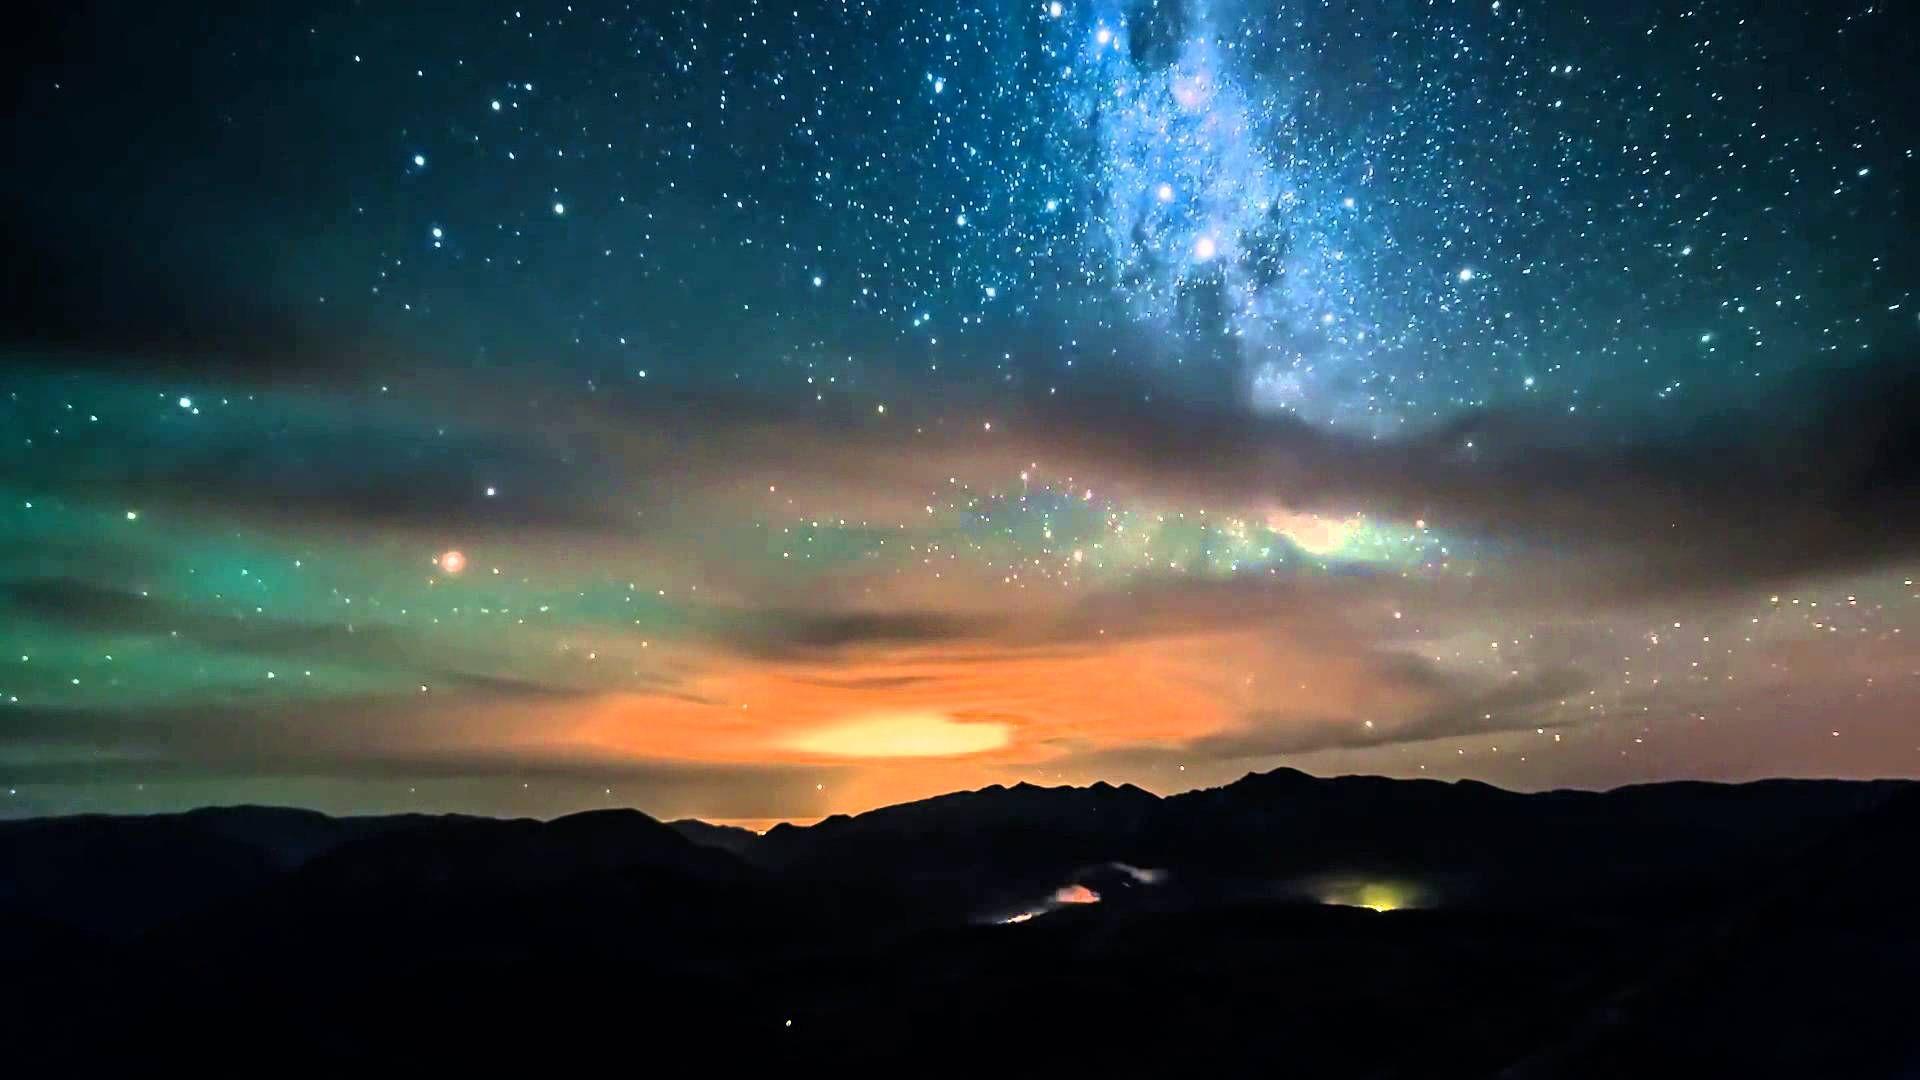 Related image Starry night sky, Night skies, Stock wallpaper